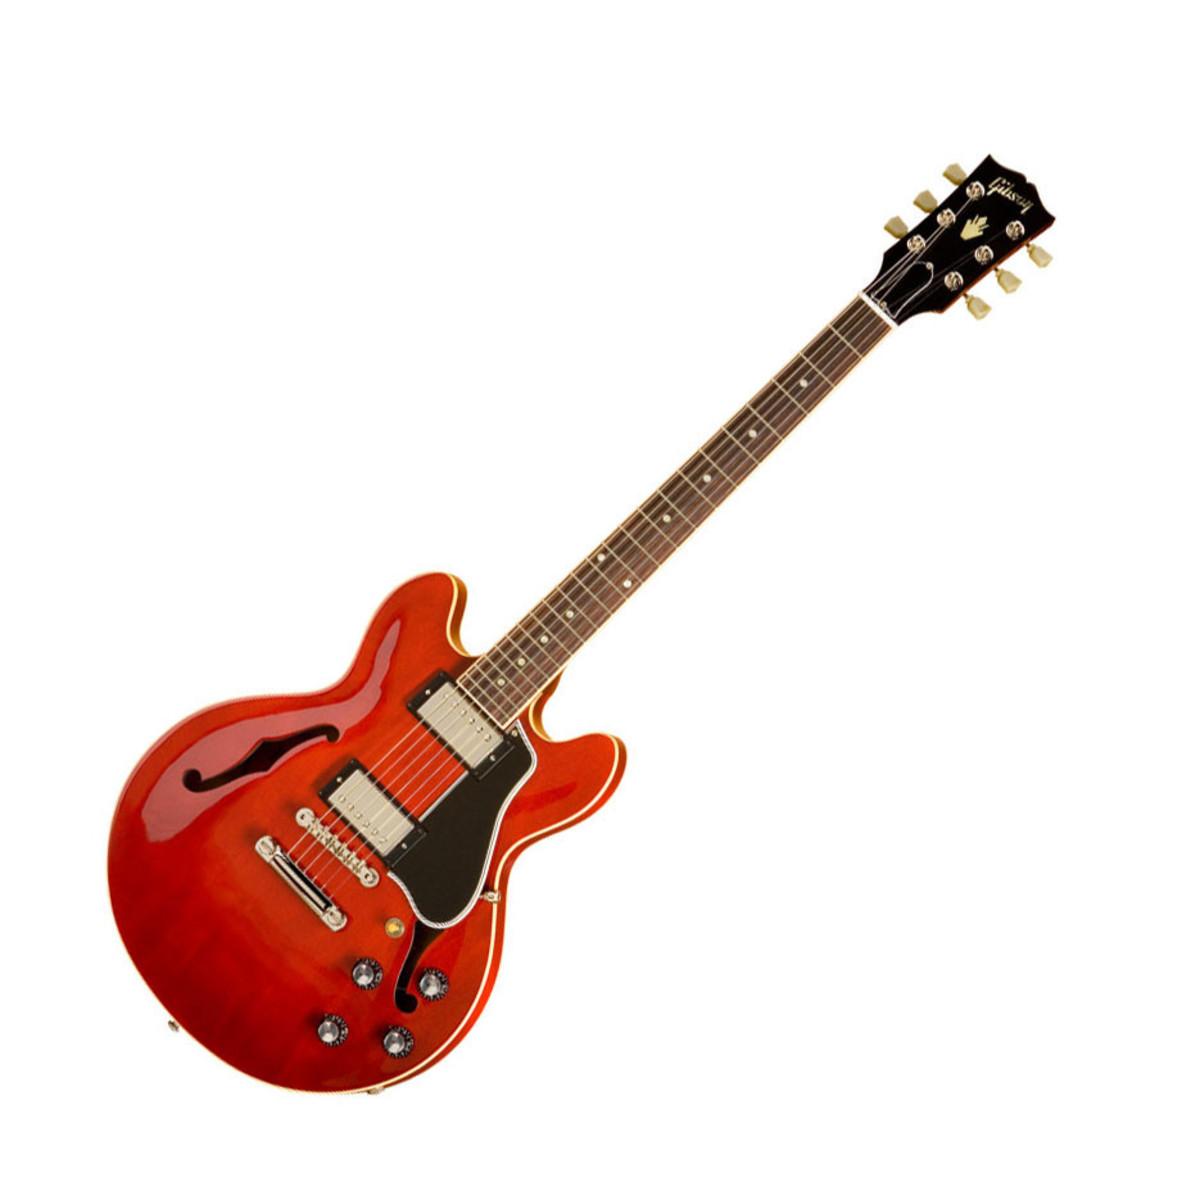 gibson les paul custom semi hollow dodge ram 2500 wiring diagram disc 2014 es 339 electric guitar faded